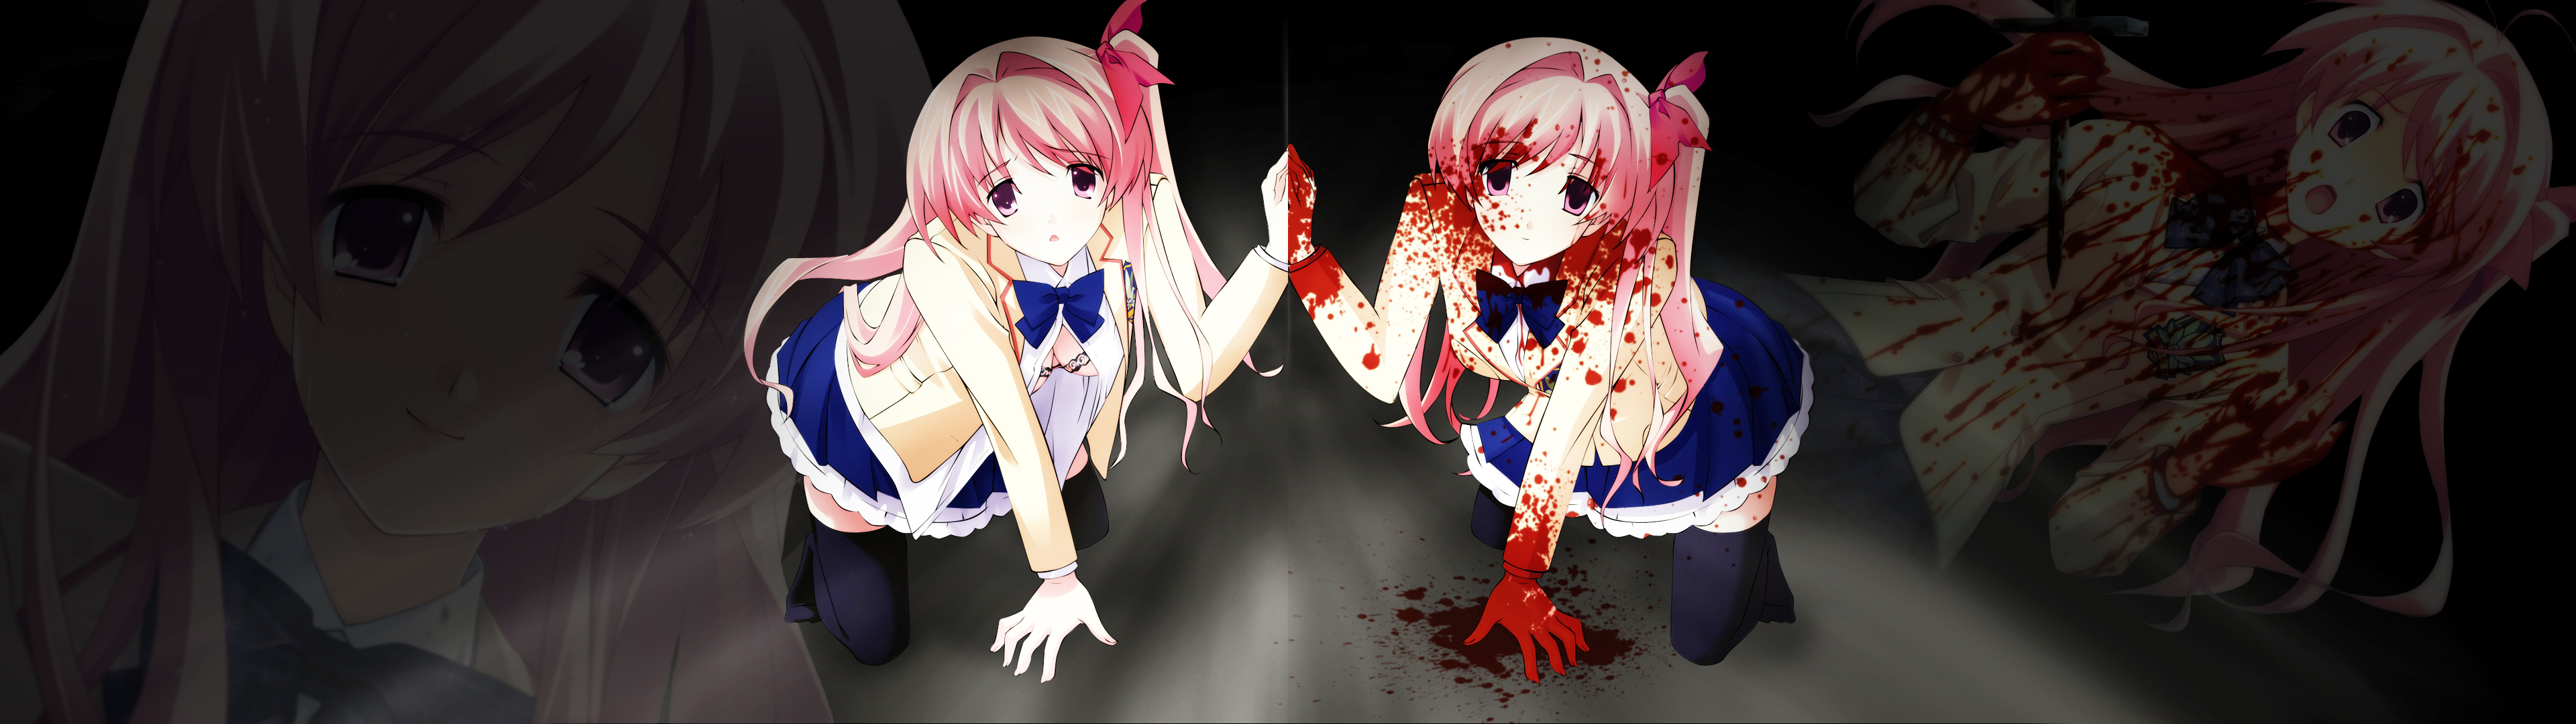 Anime Full Hd Wallpaper And Hintergrund  3840X1080  Id -6566